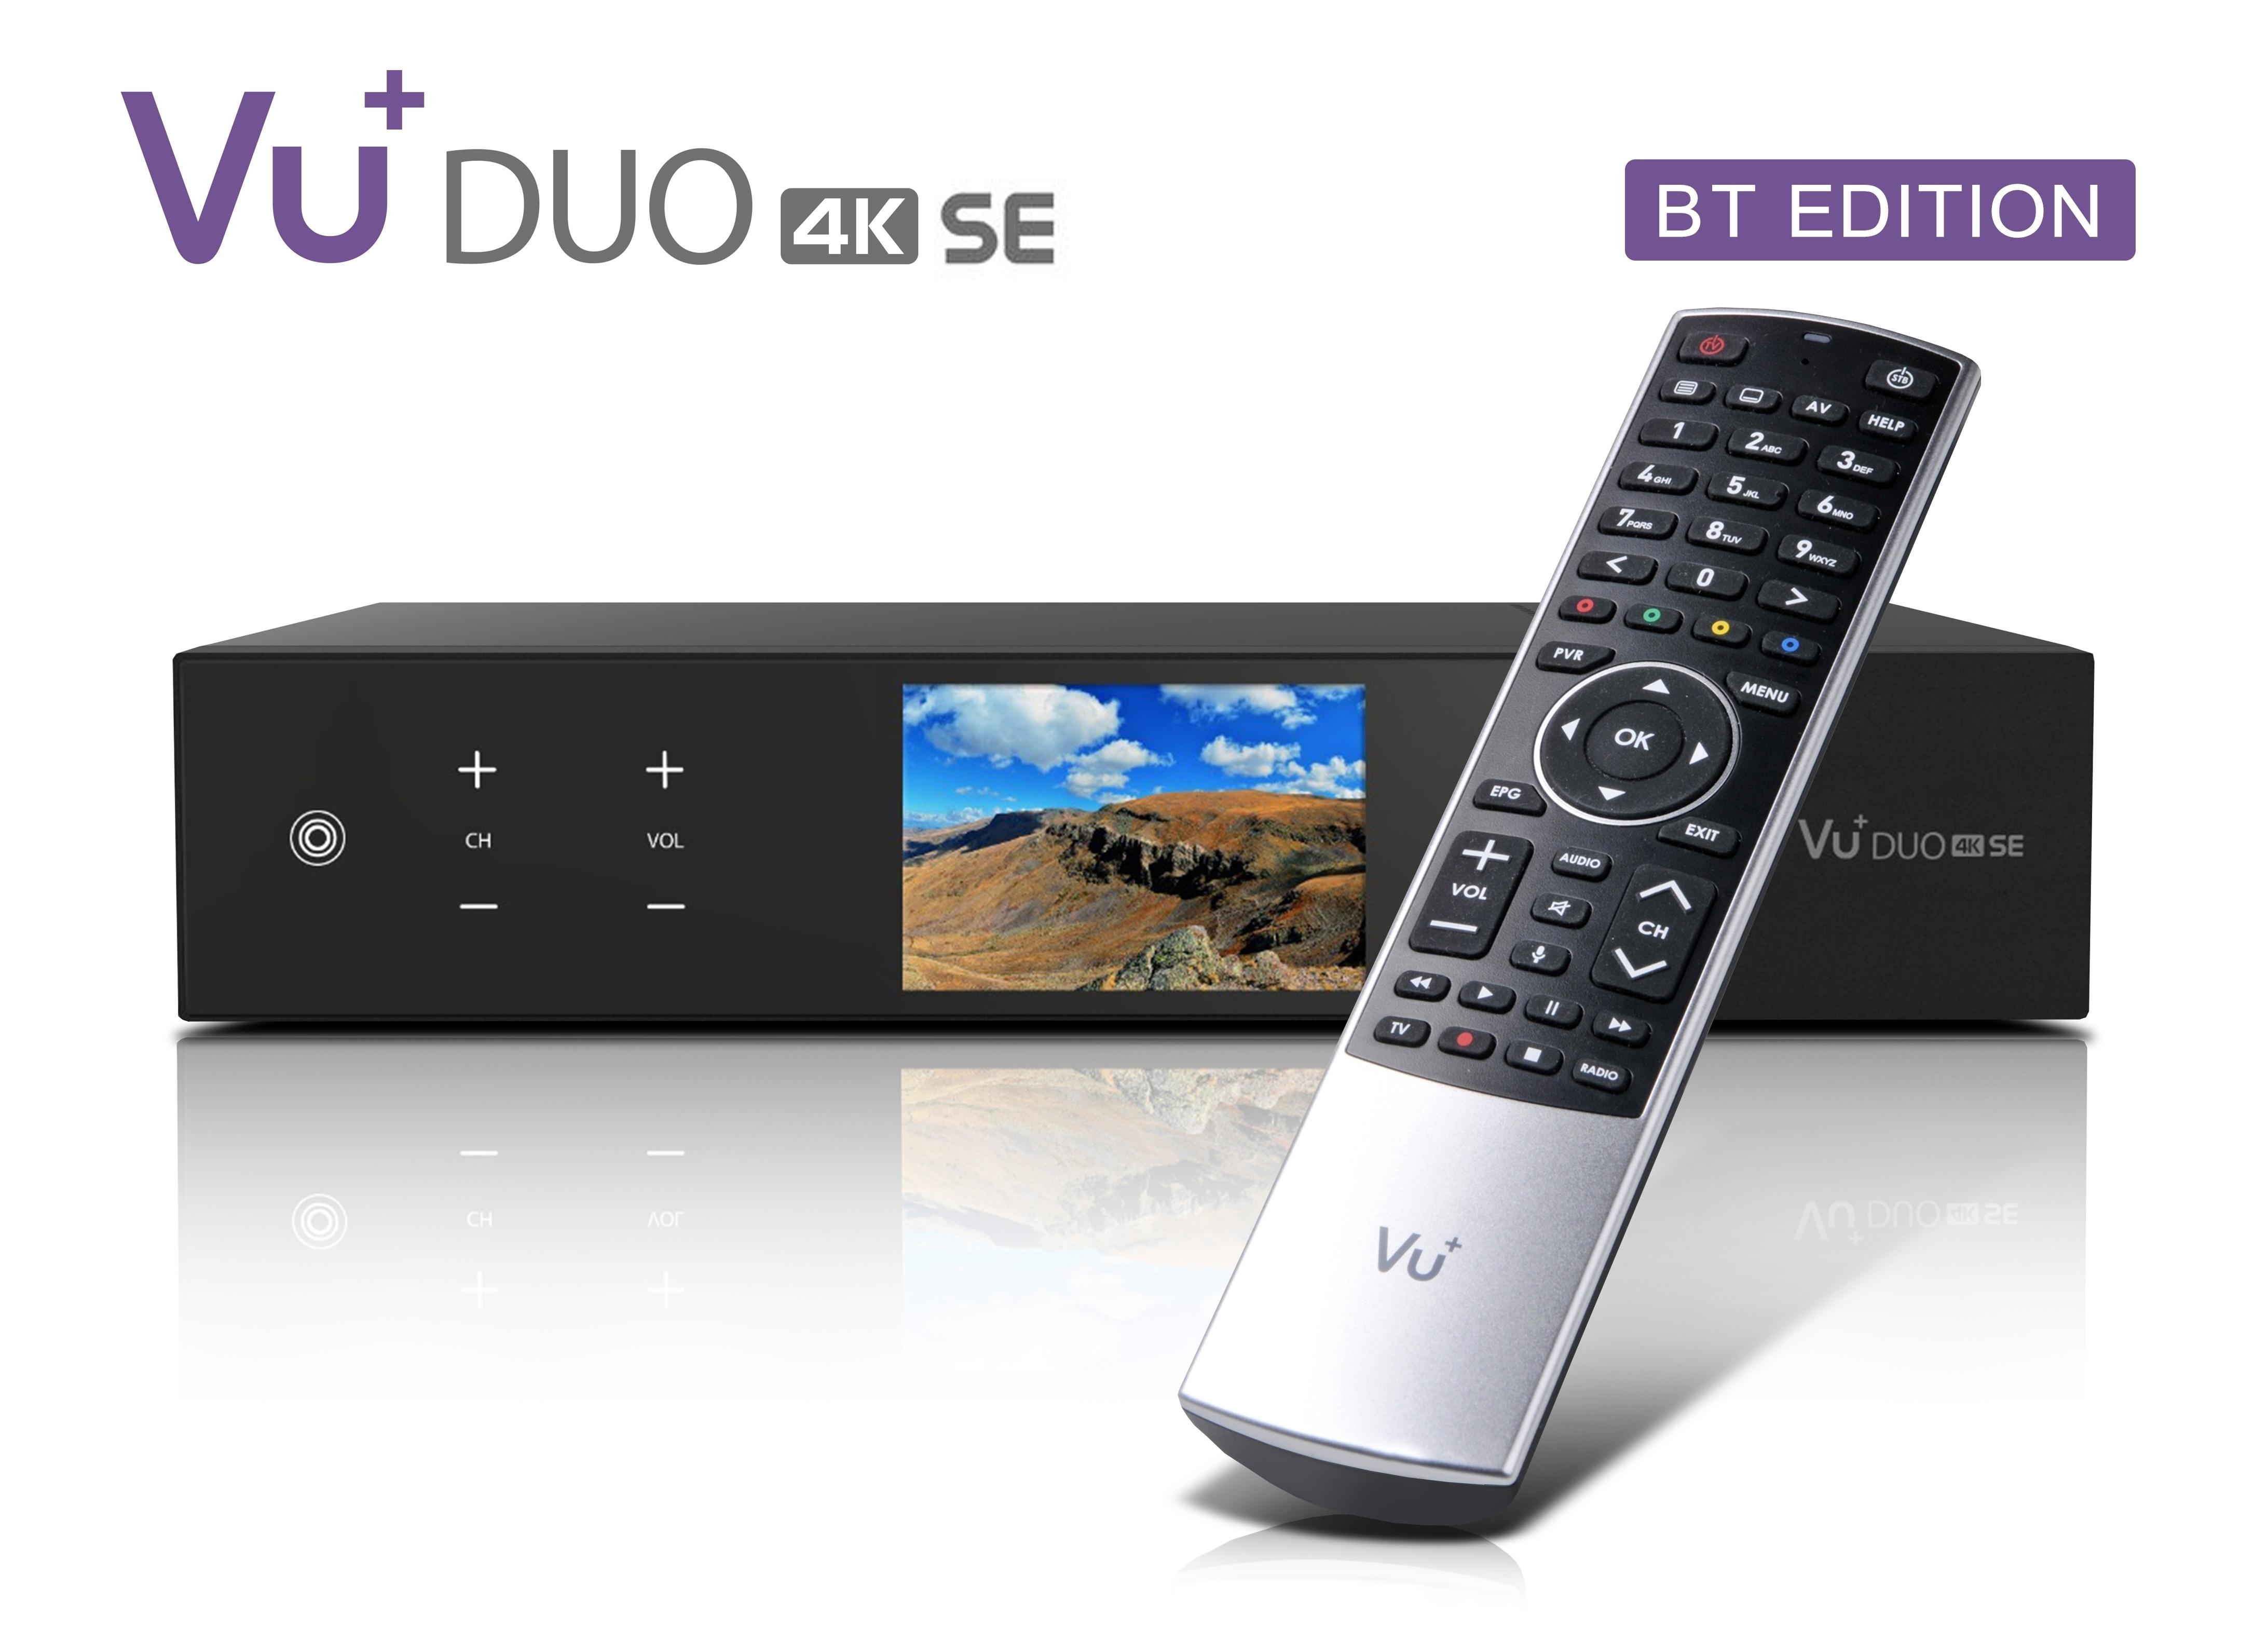 Receiver & Tuner VU+ Duo 4K SE BT 2x DVB-T2 Dual Tuner 5 TB HDD Linux Receiver UHD 2160p